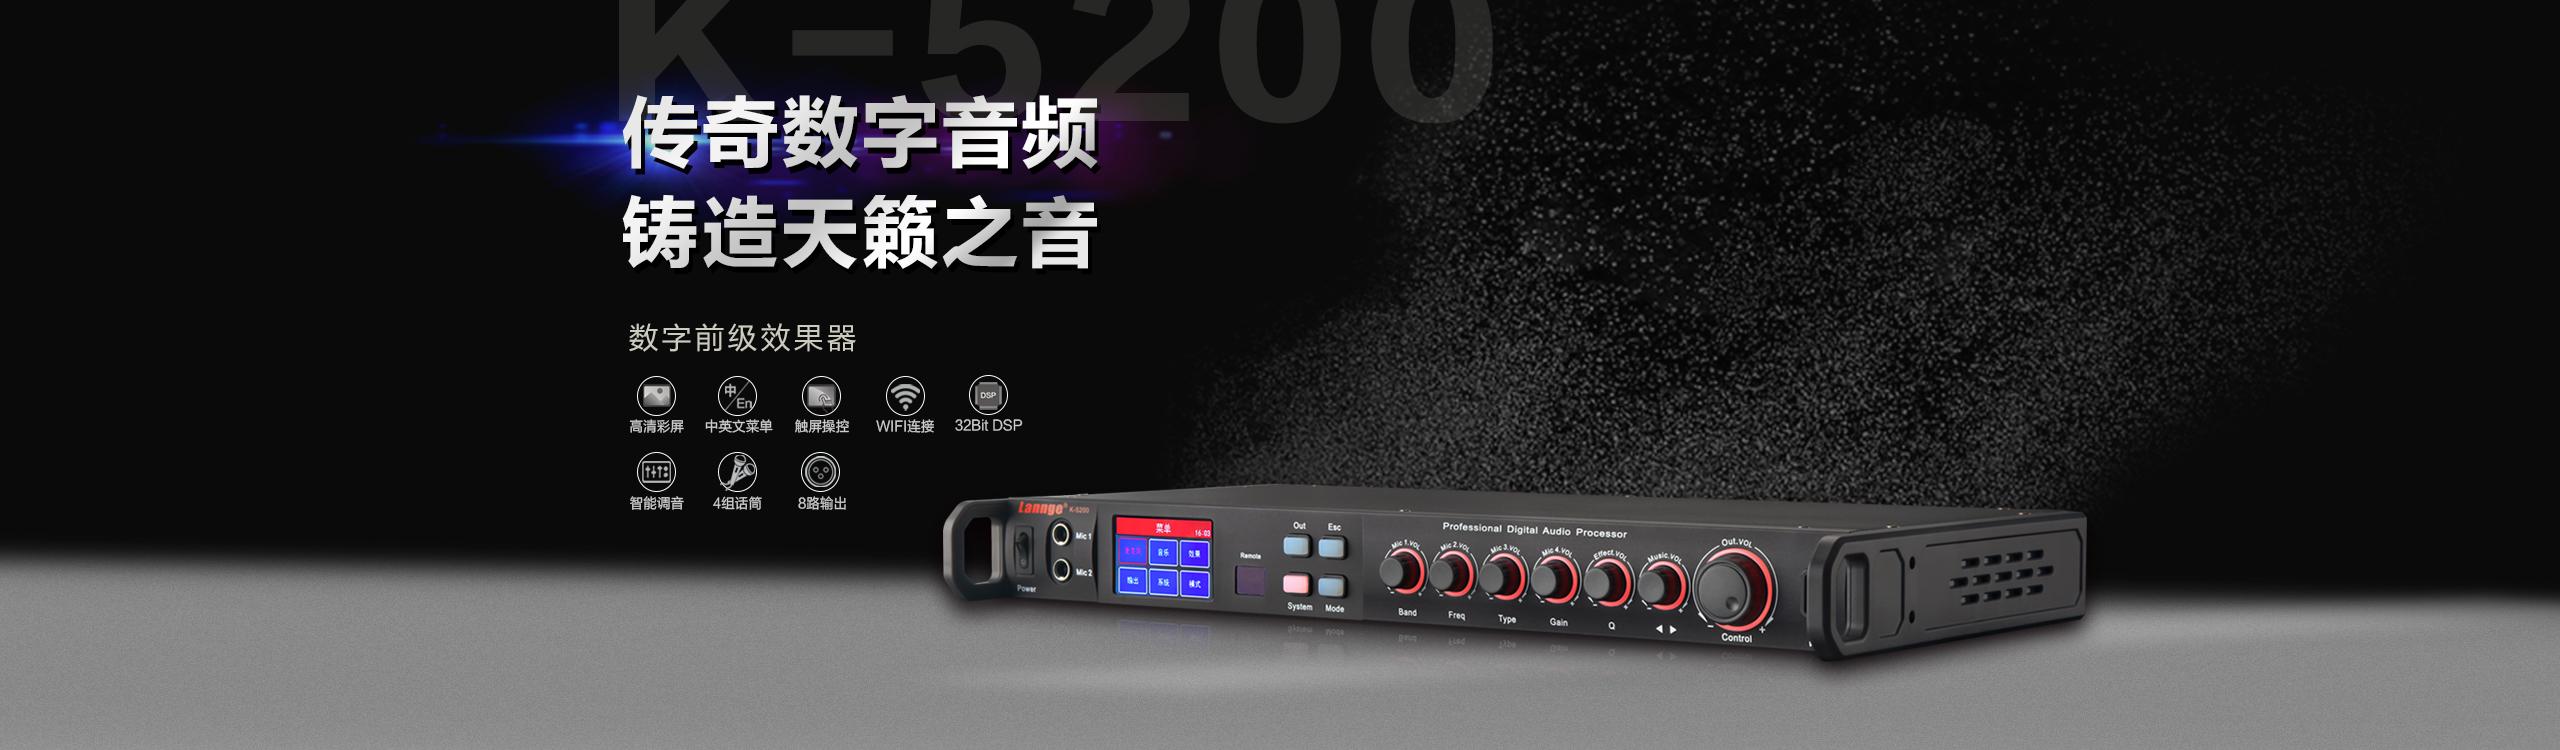 K-5200